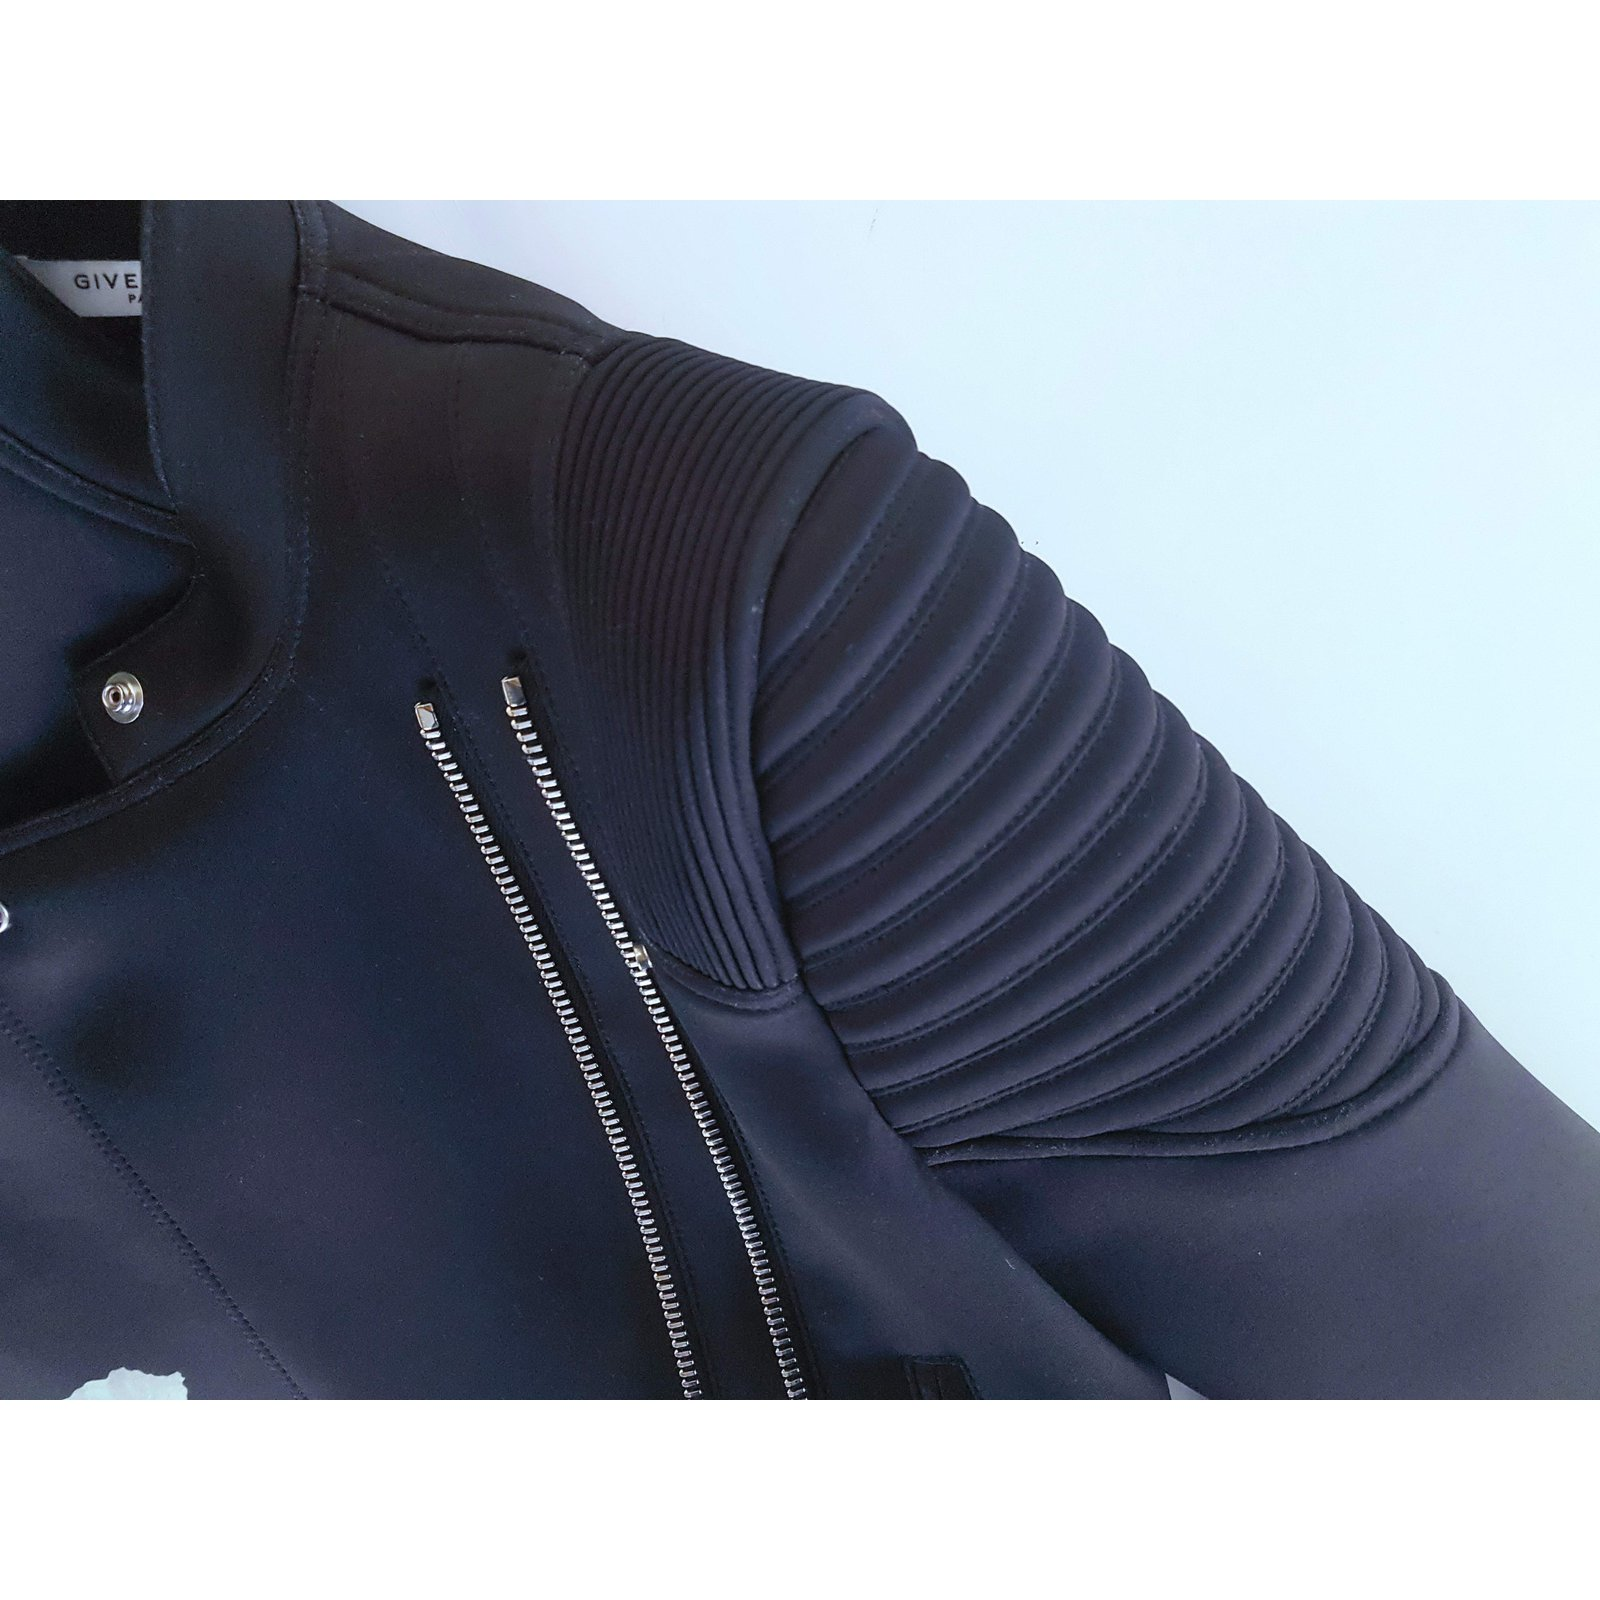 3510695fcaacf Givenchy Jackets Jackets Other Black ref.58655 - Joli Closet